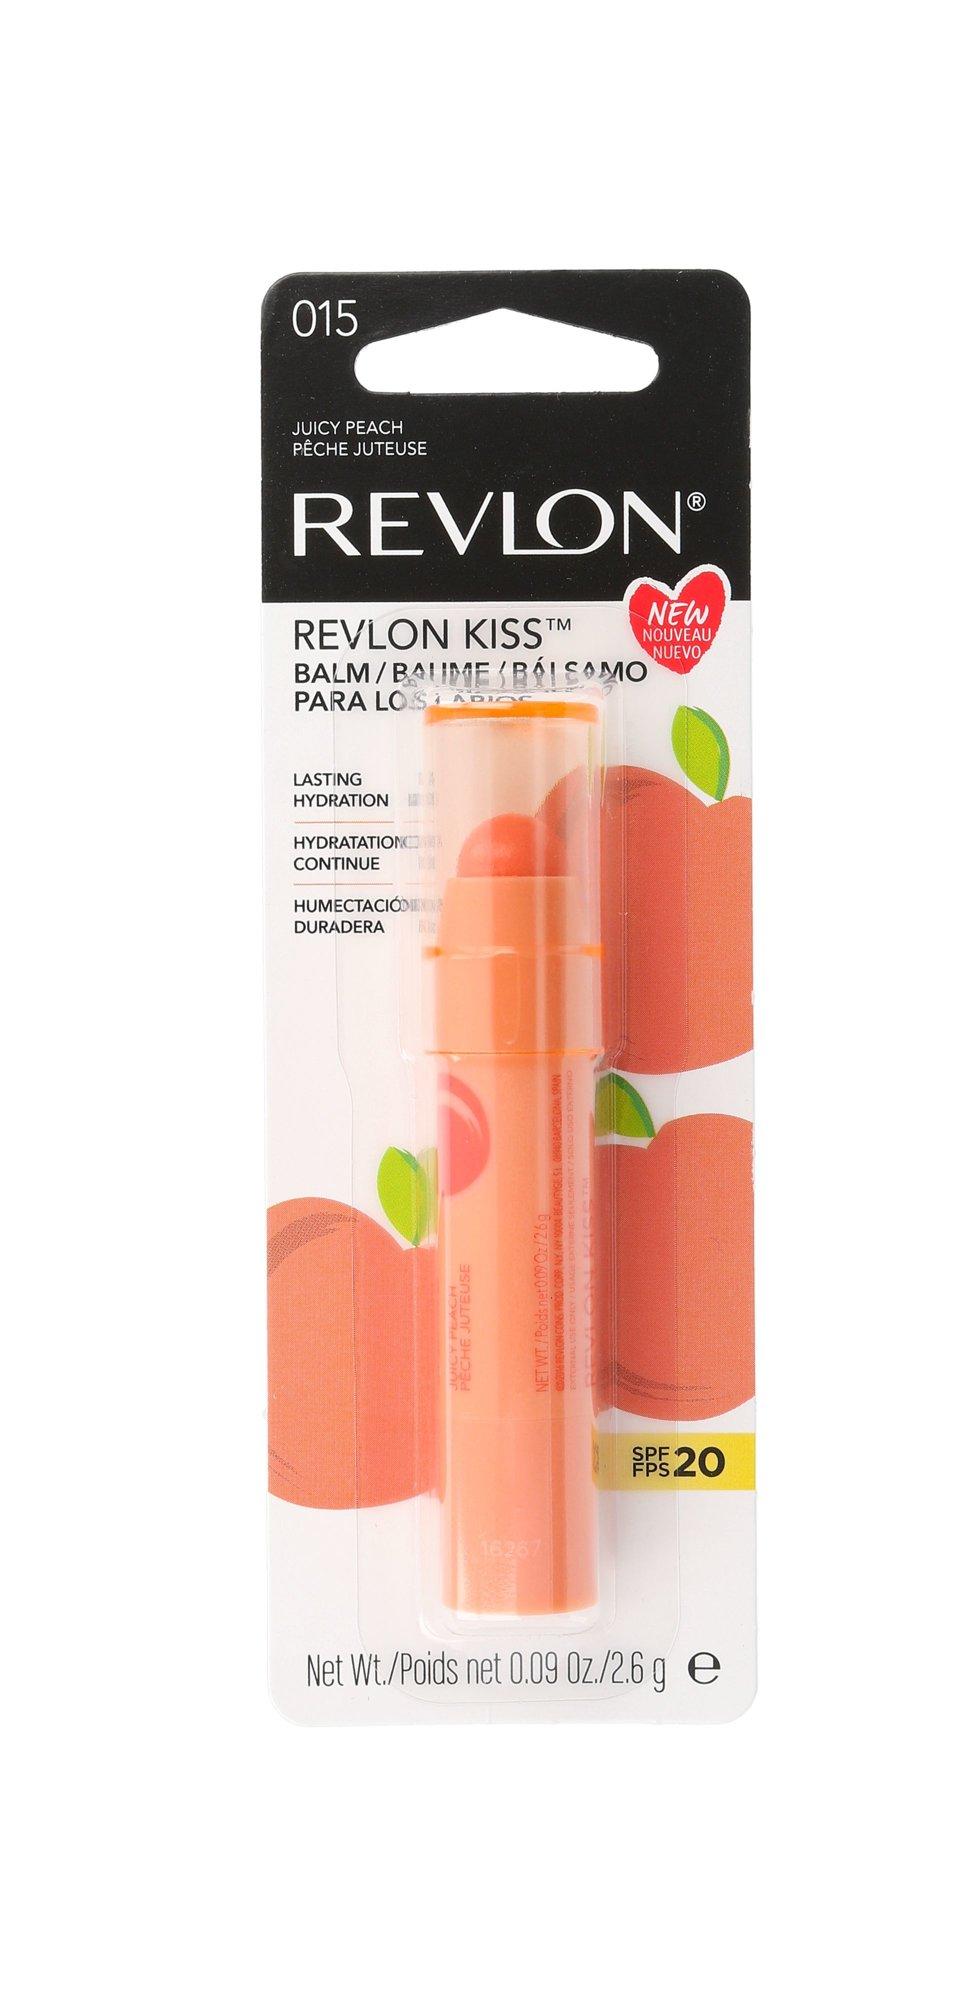 Revlon Revlon Kiss Cosmetic 2,6ml 015 Juicy Peach